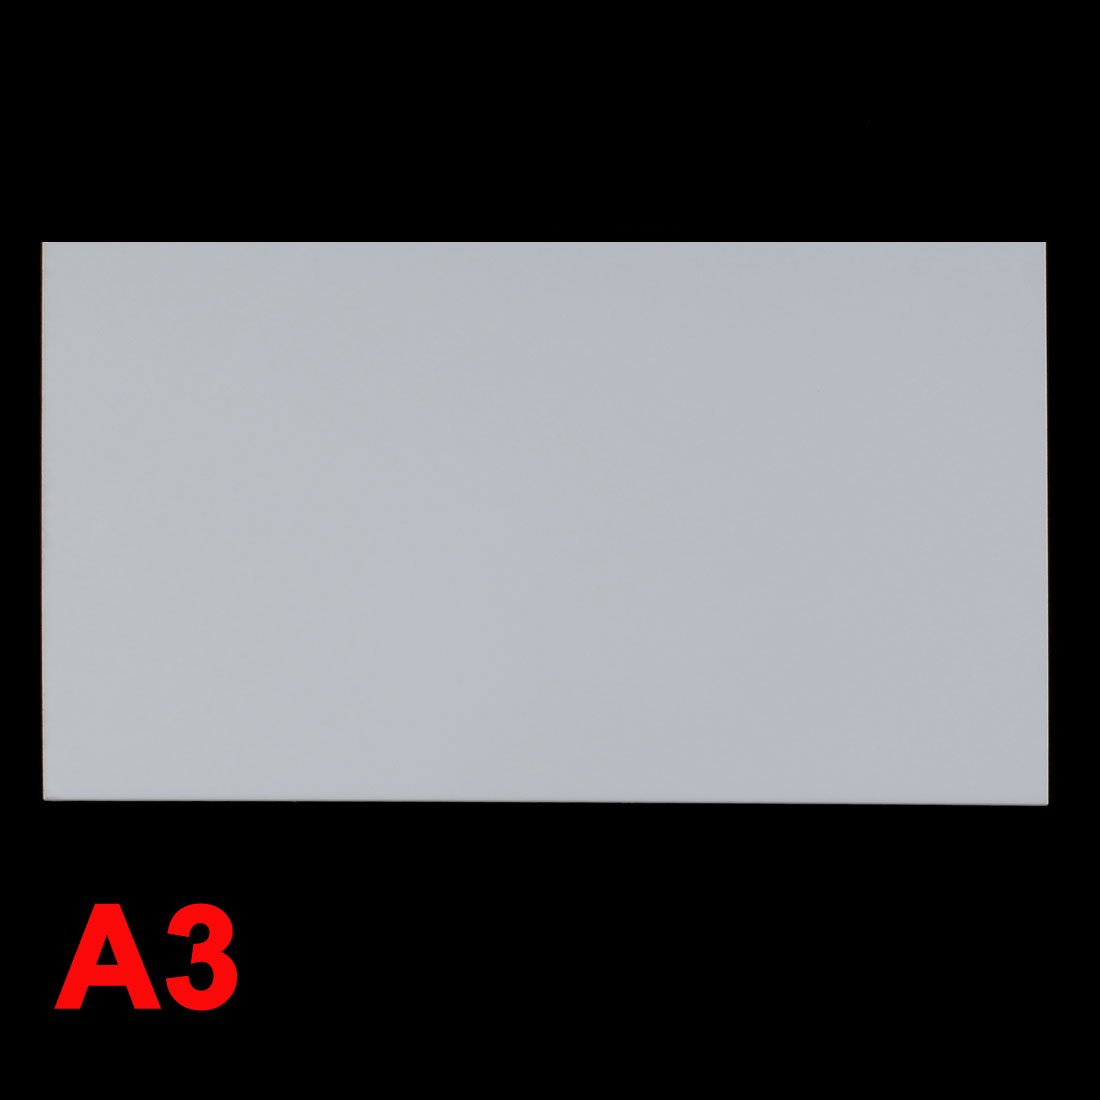 White Plastic Acrylic Plexiglass Sheet A3 Size 297mm x 420mm x 5mm